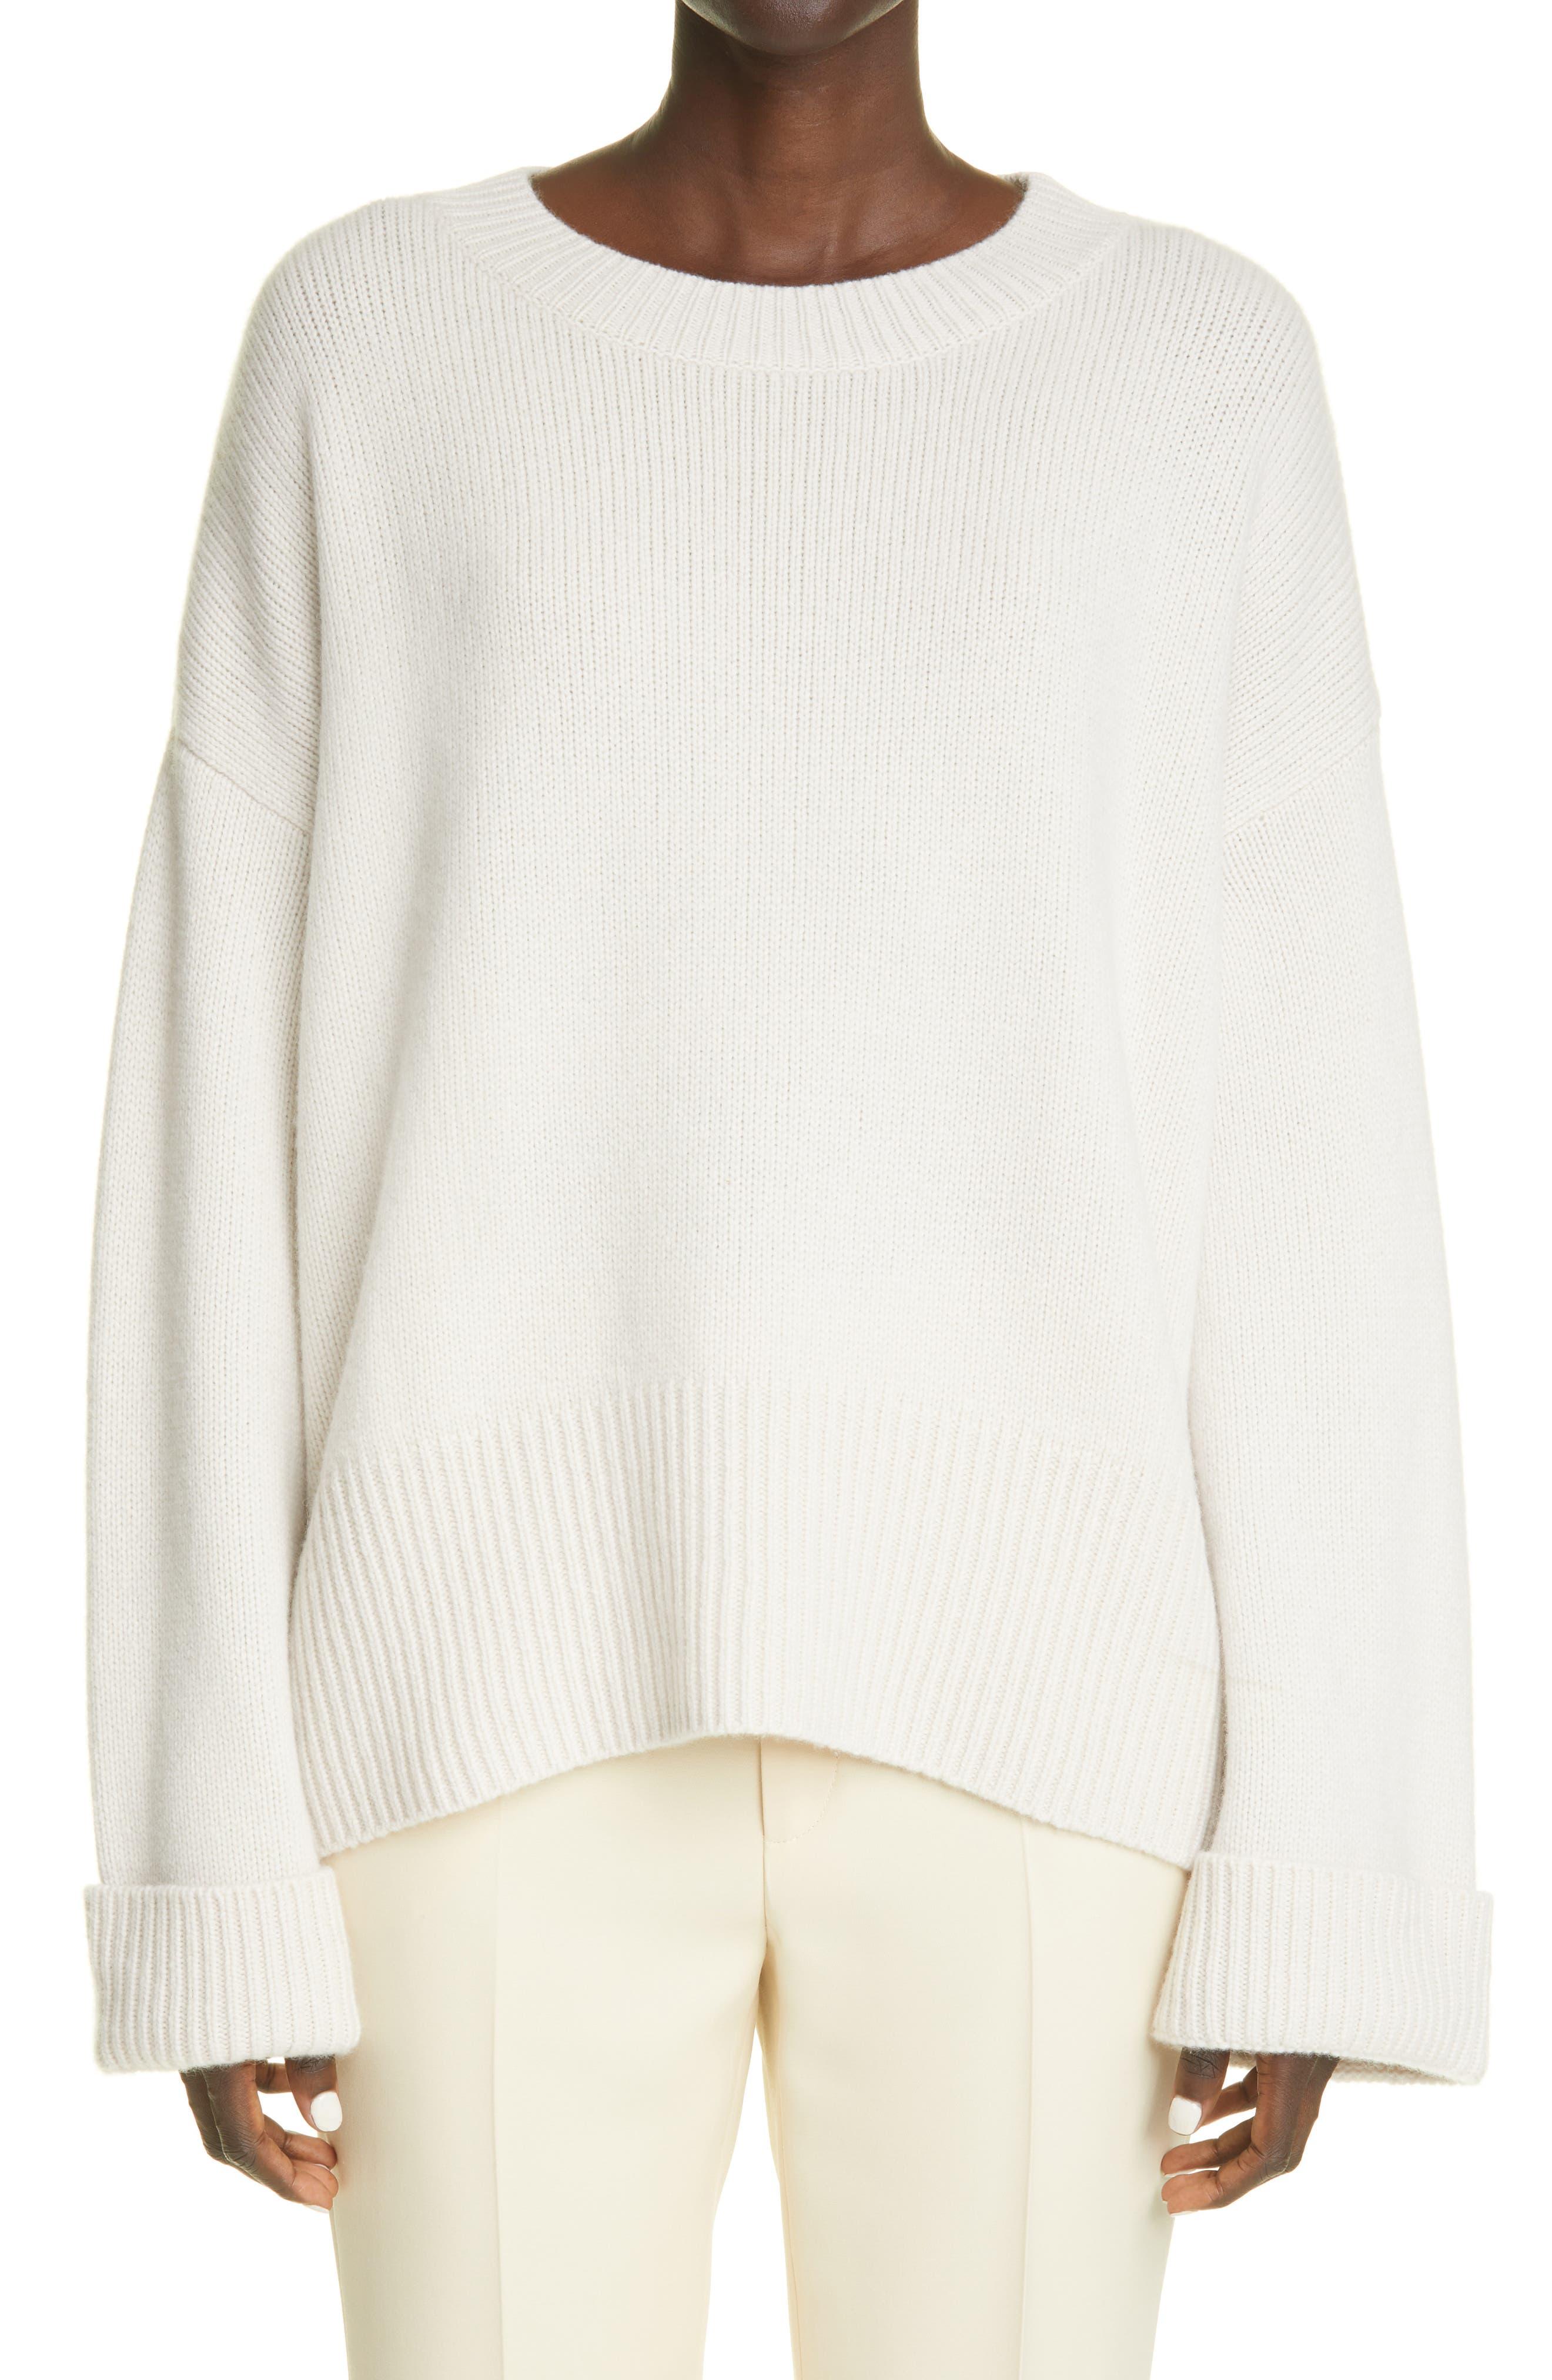 Knightsbridge Oversize Cashmere Sweater